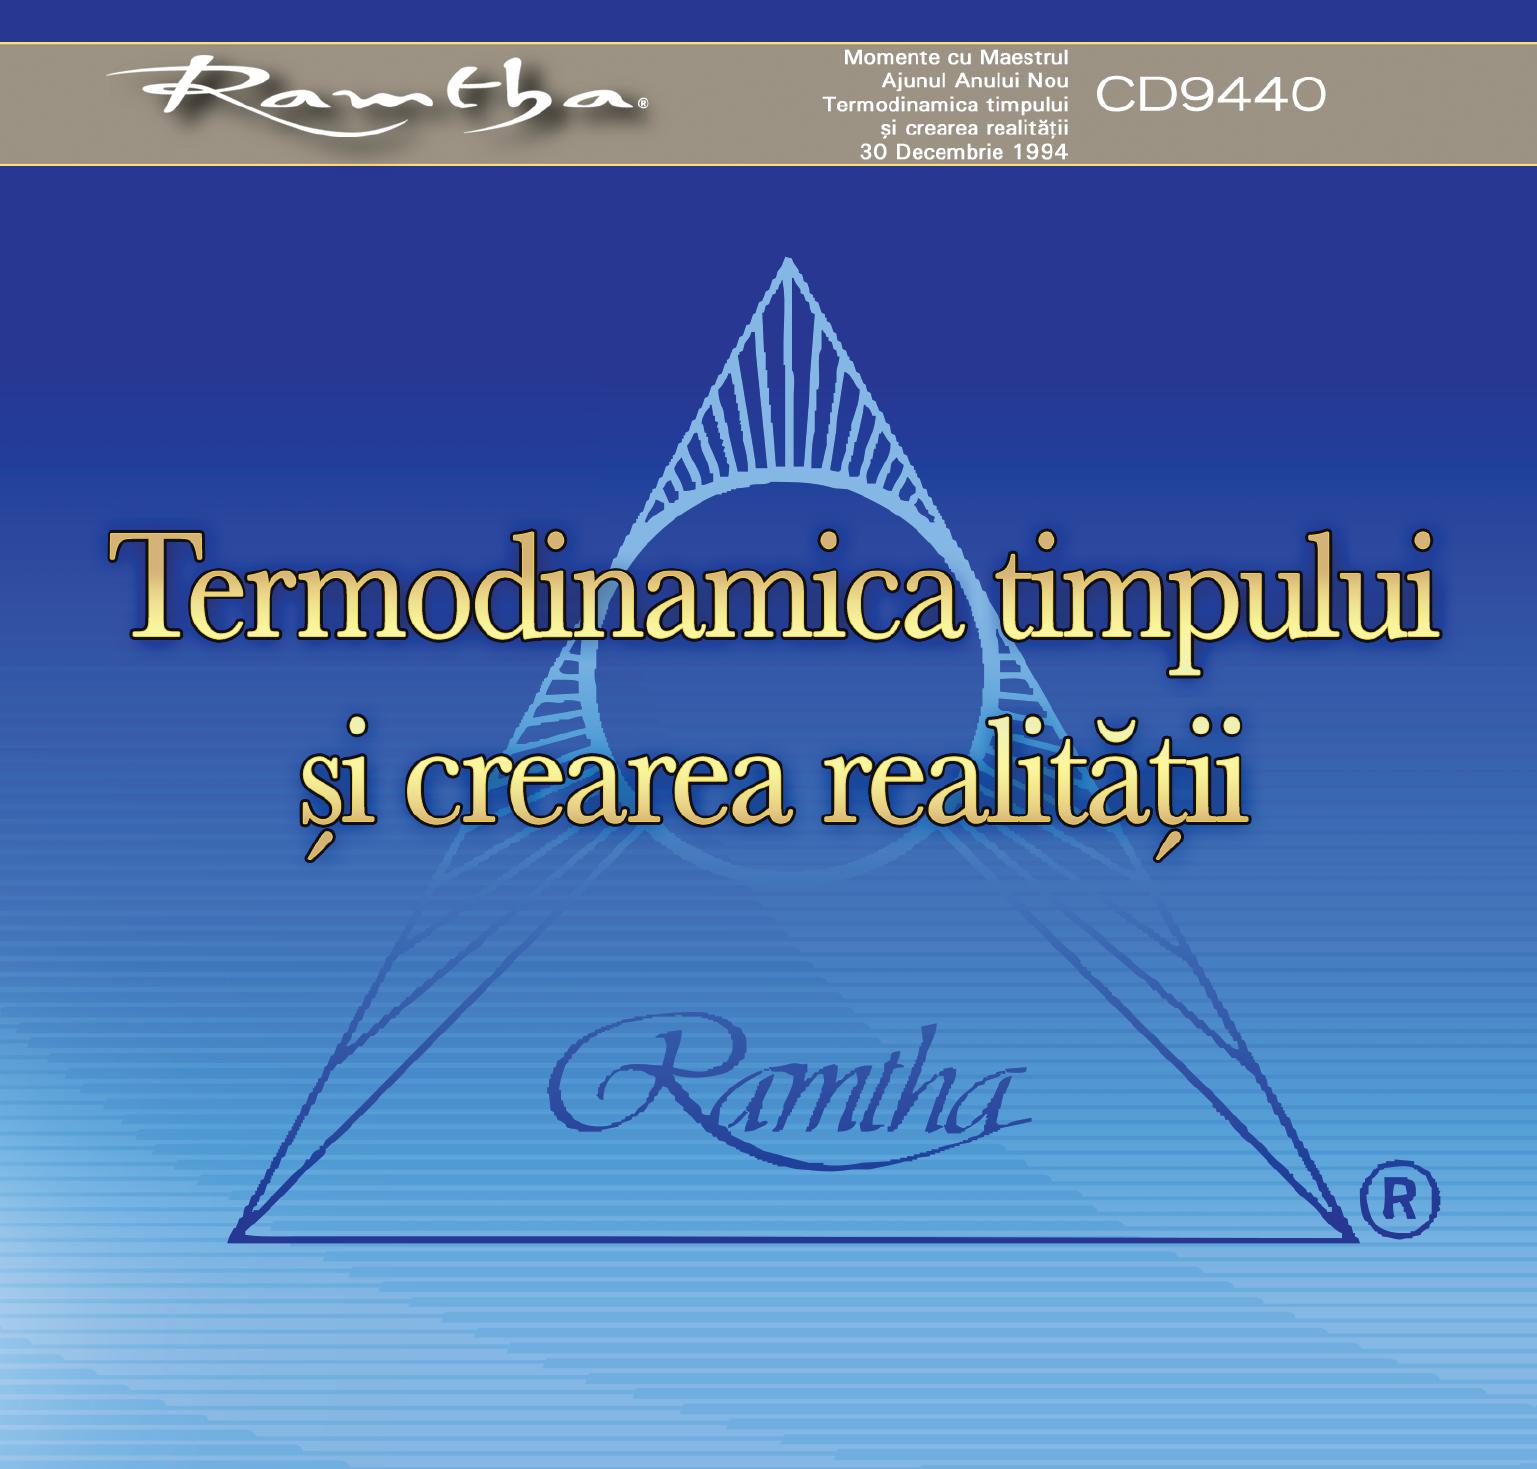 Ram-Romania